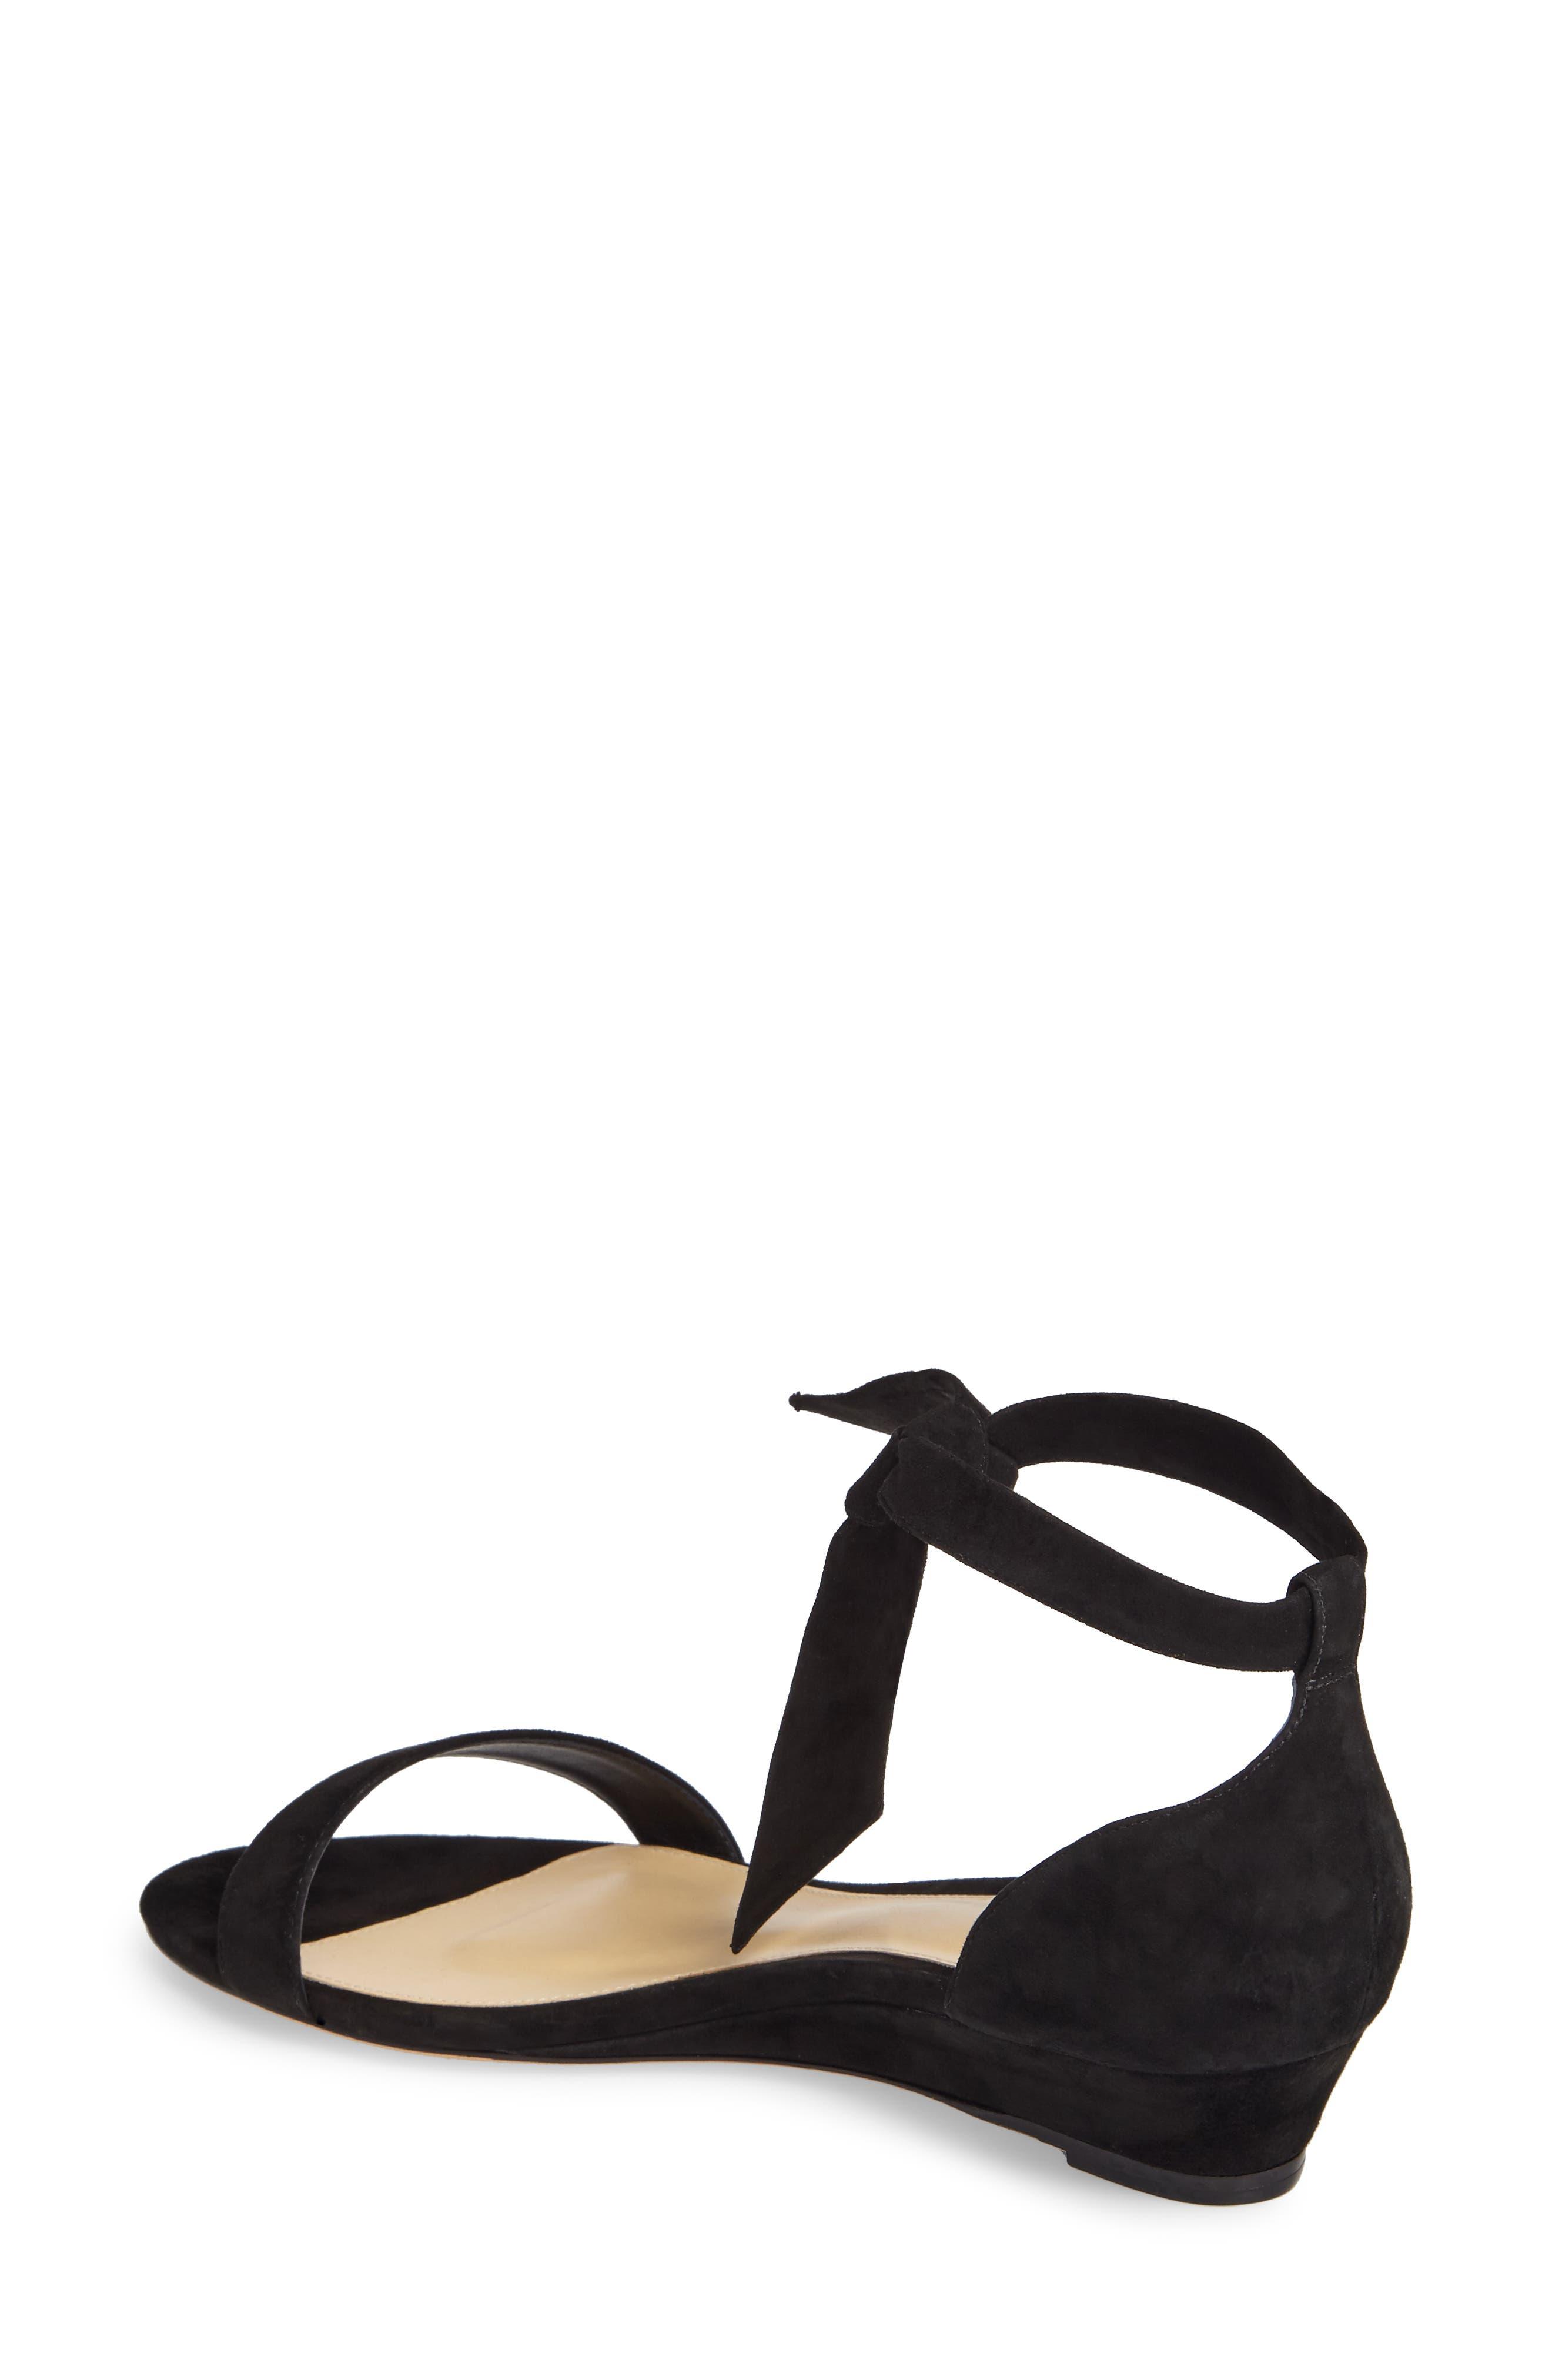 Atena Tie Strap Wedge Sandal,                             Alternate thumbnail 2, color,                             001